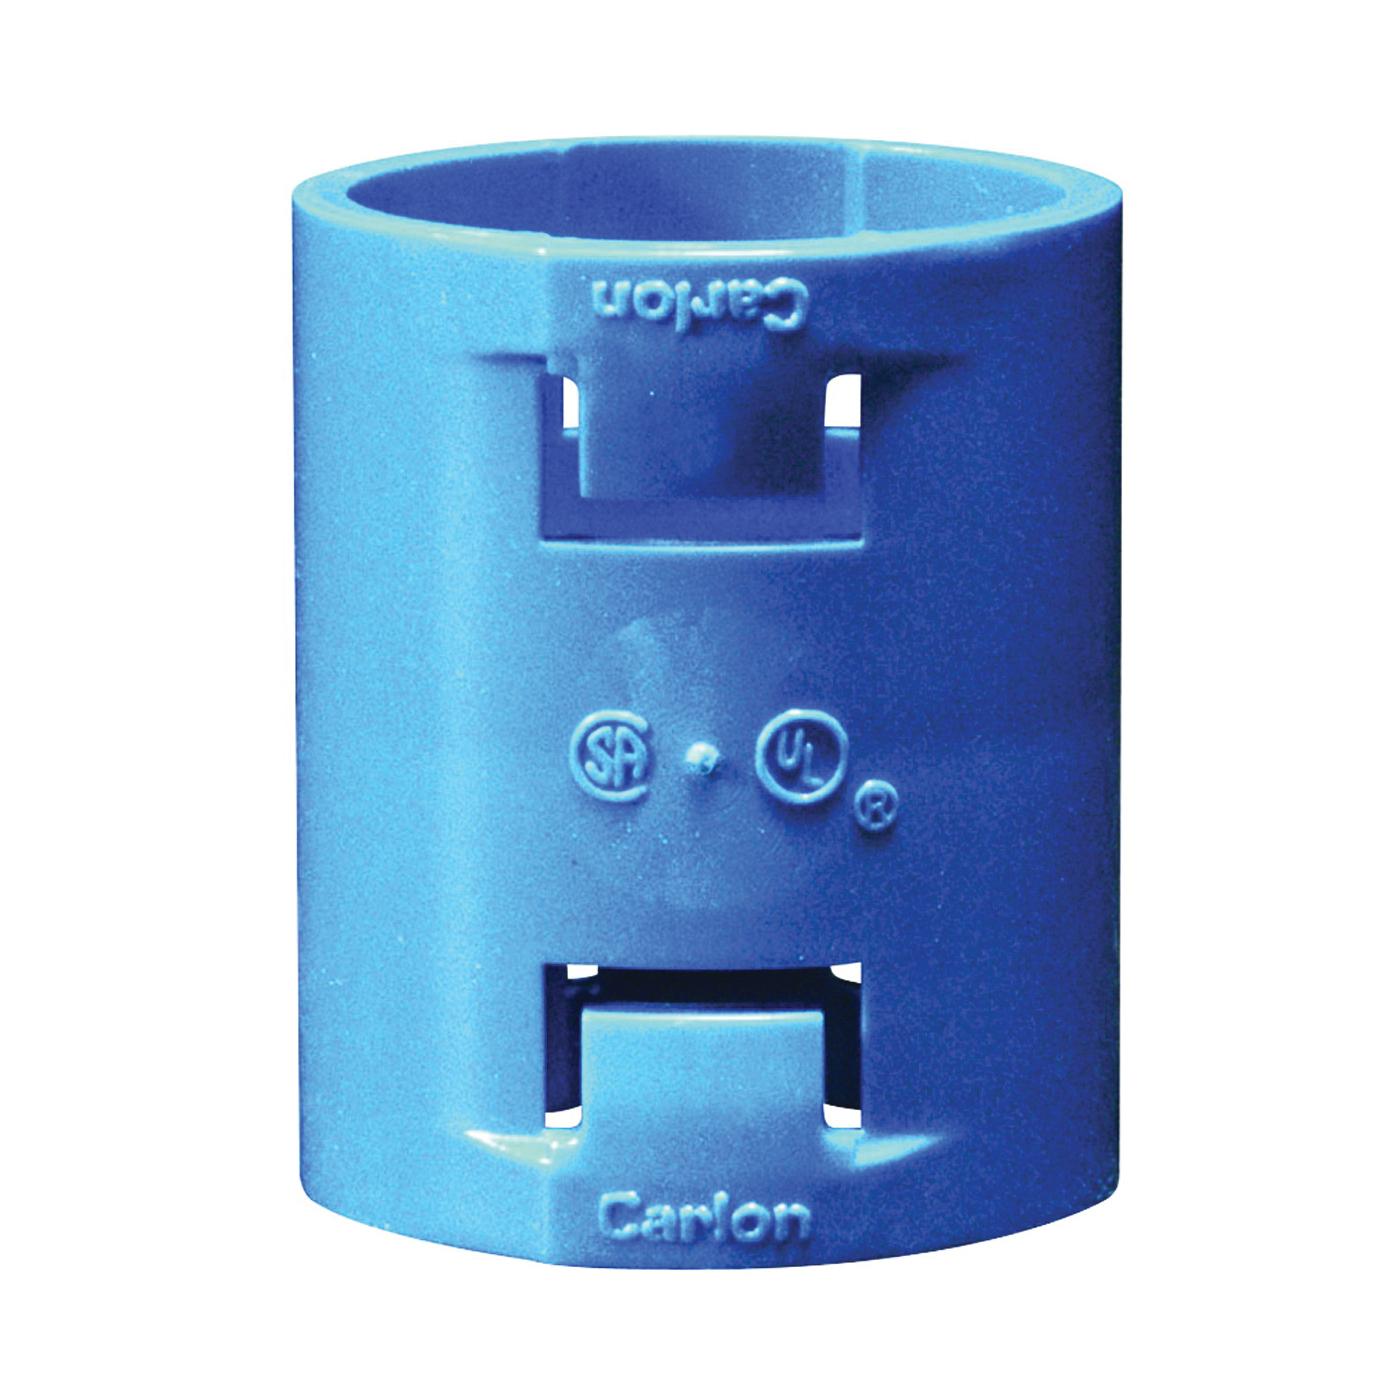 Picture of Carlon A240E-CAR Conduit Coupling, 3/4 in Trade, 1.856 in L, Polycarbonate, Blue